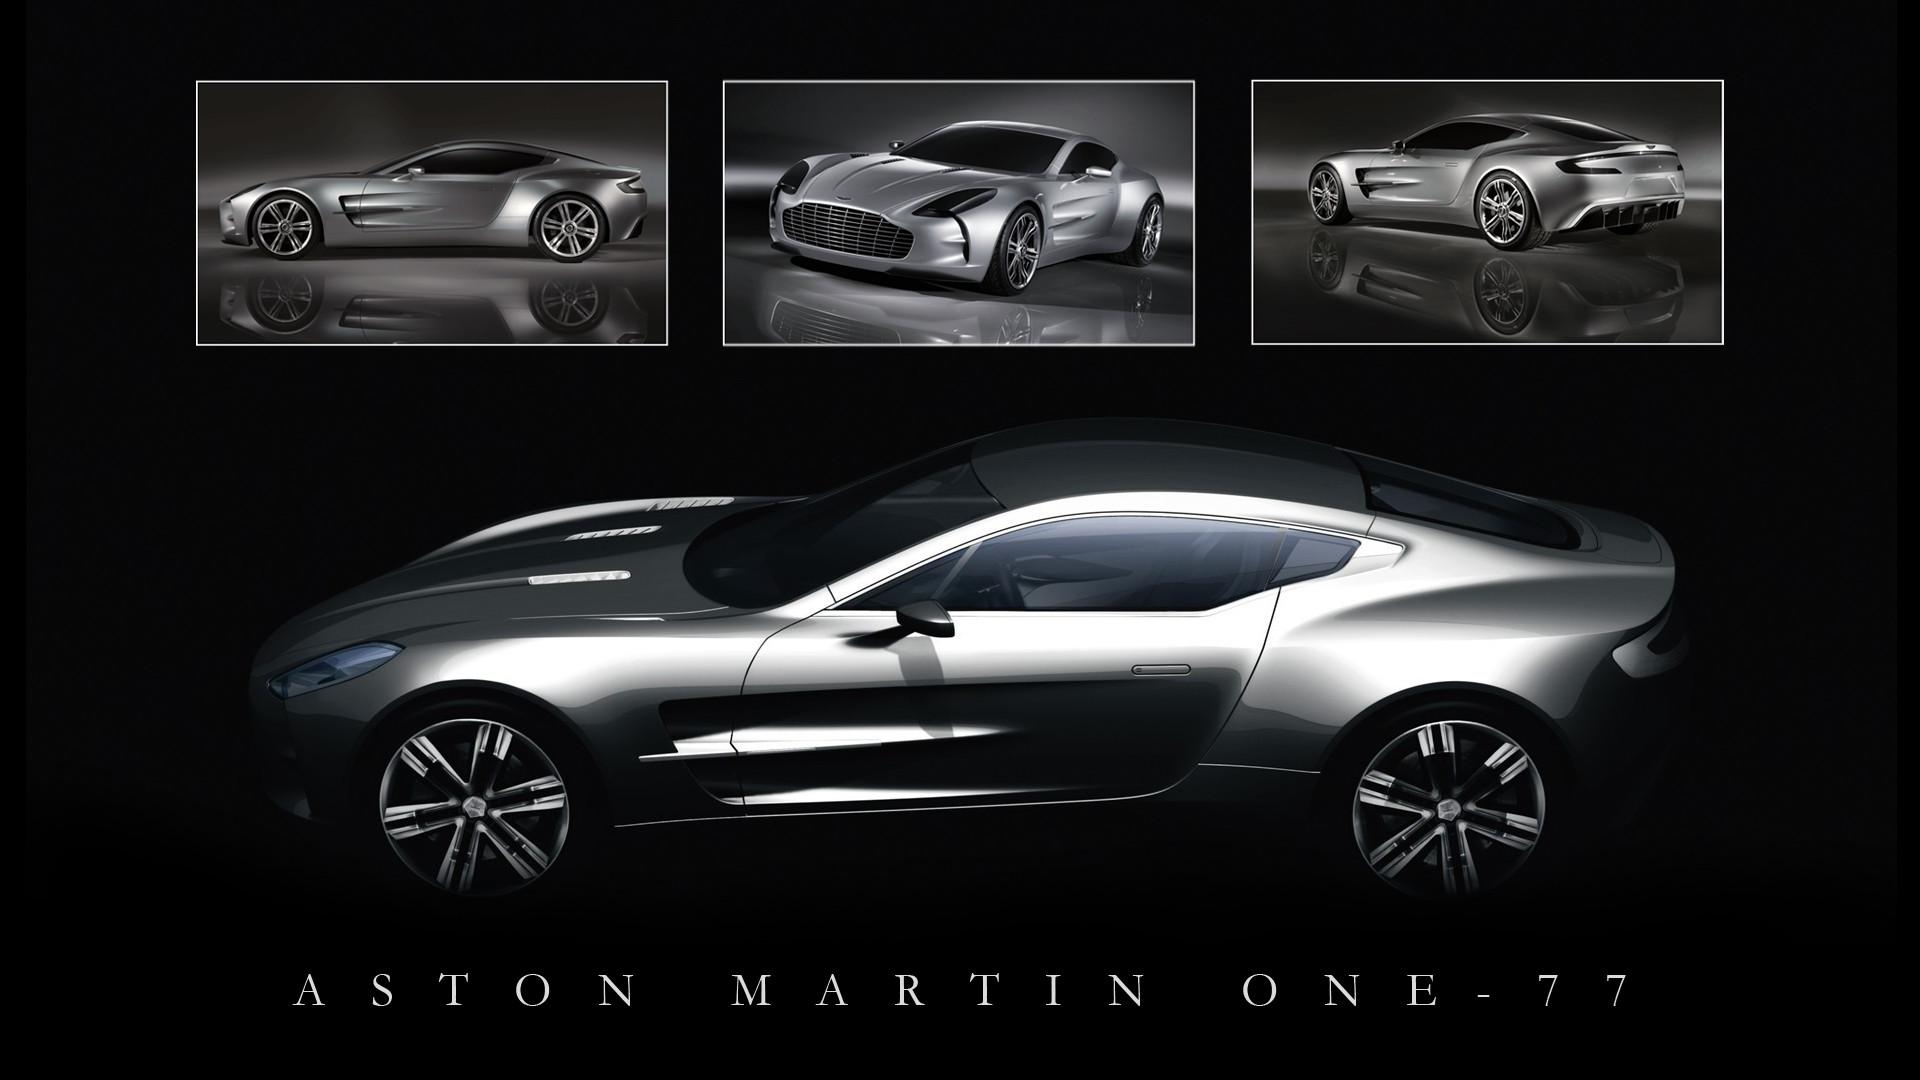 Car Wallpaper Full Hd 1080x1920 Aston Martin Logo Wallpapers 55 Images